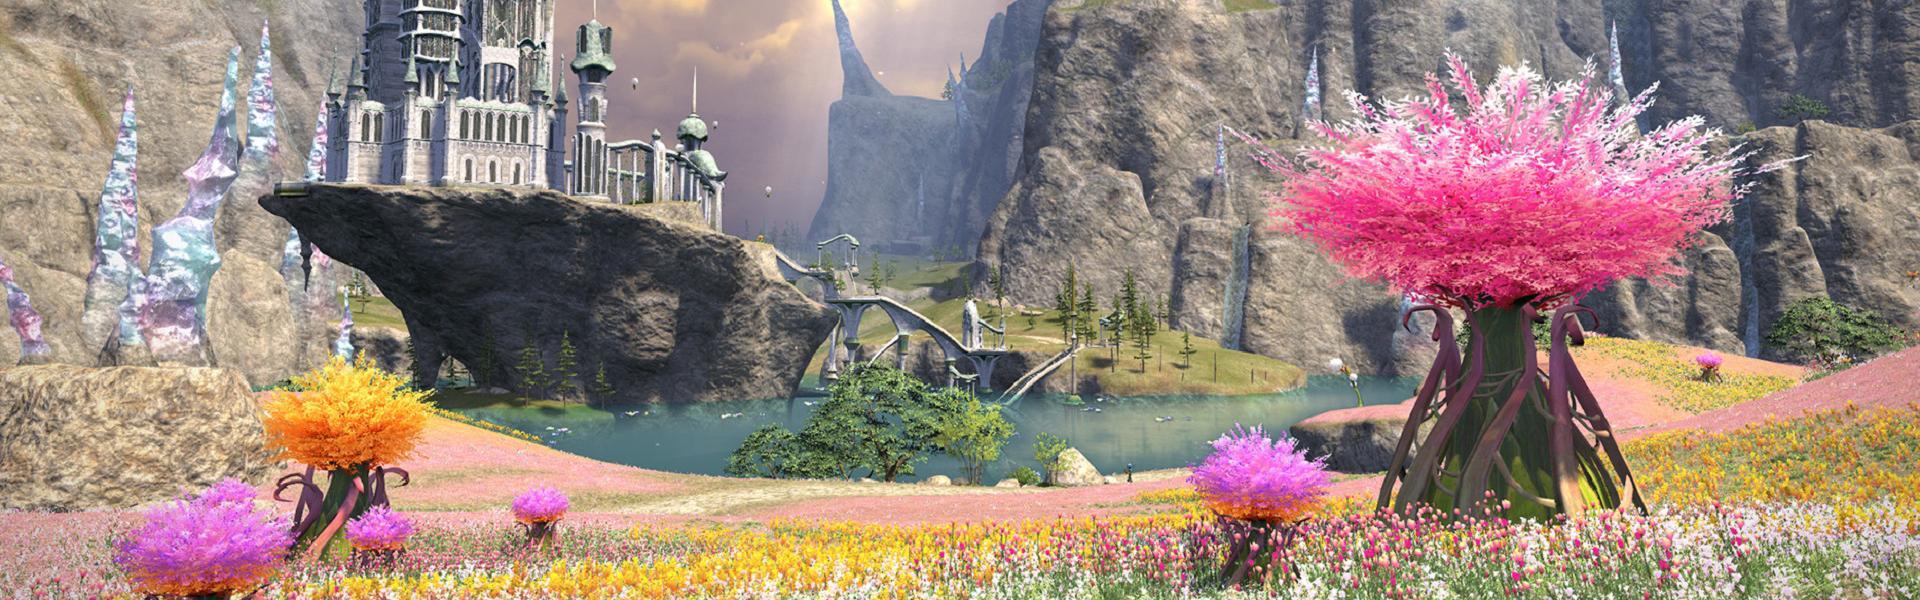 Final Fantasy XIV: Shadowbringers' Gets Six-Minute Cinematic Trailer